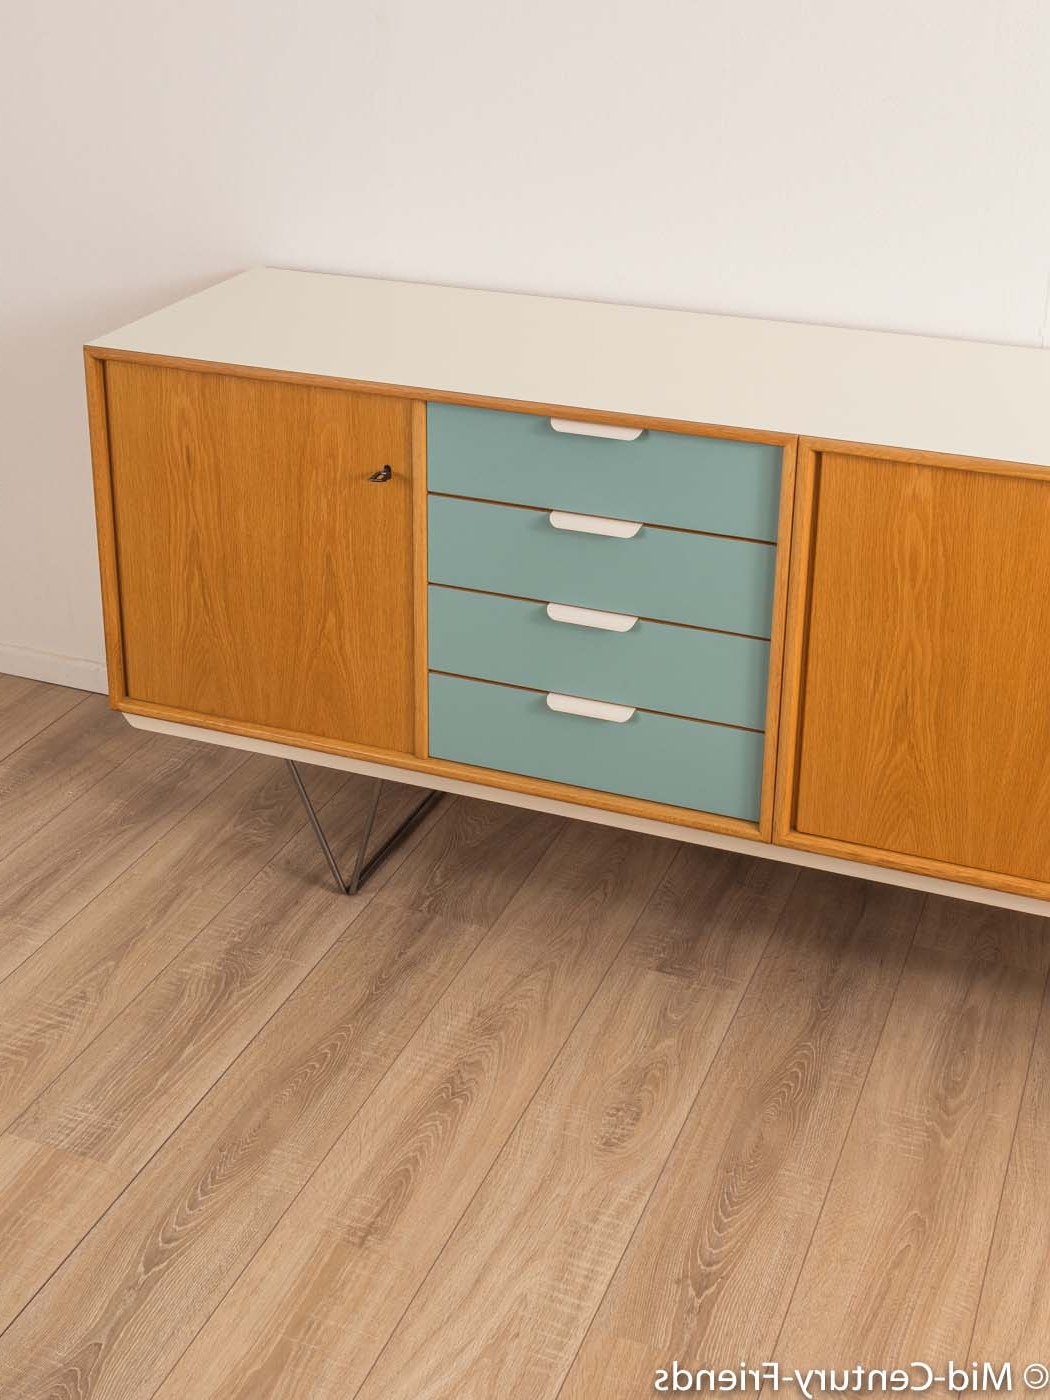 1960Er Jahre Sideboard, Heinrich Riestenpatt|Mid Century Friends Within Mid Century Brown And Grey Sideboards (View 1 of 20)